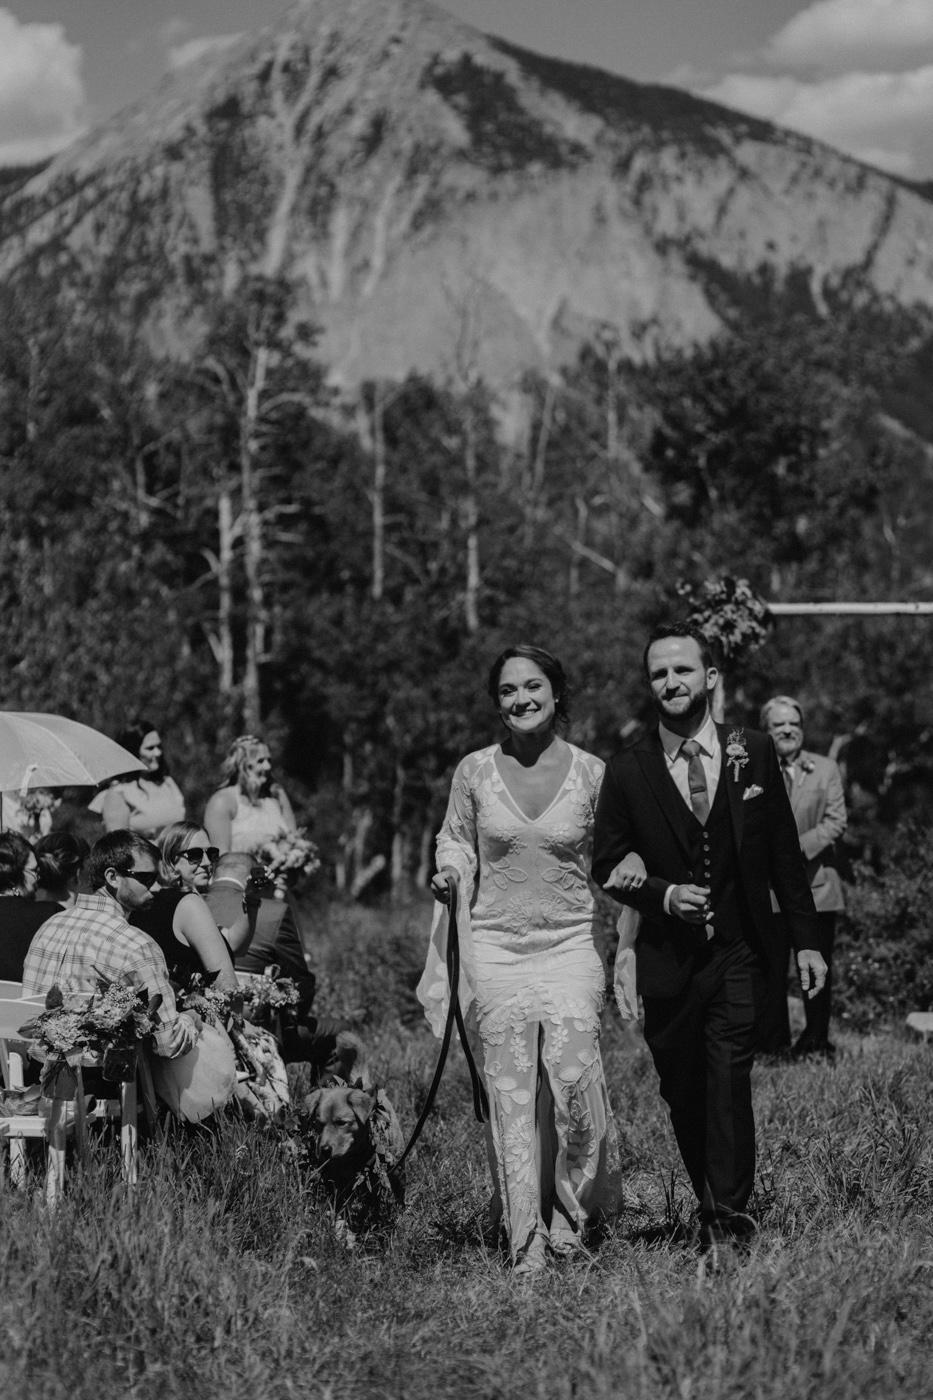 woods-walk-trail-crested-butte-colorado-wedding-56.jpg